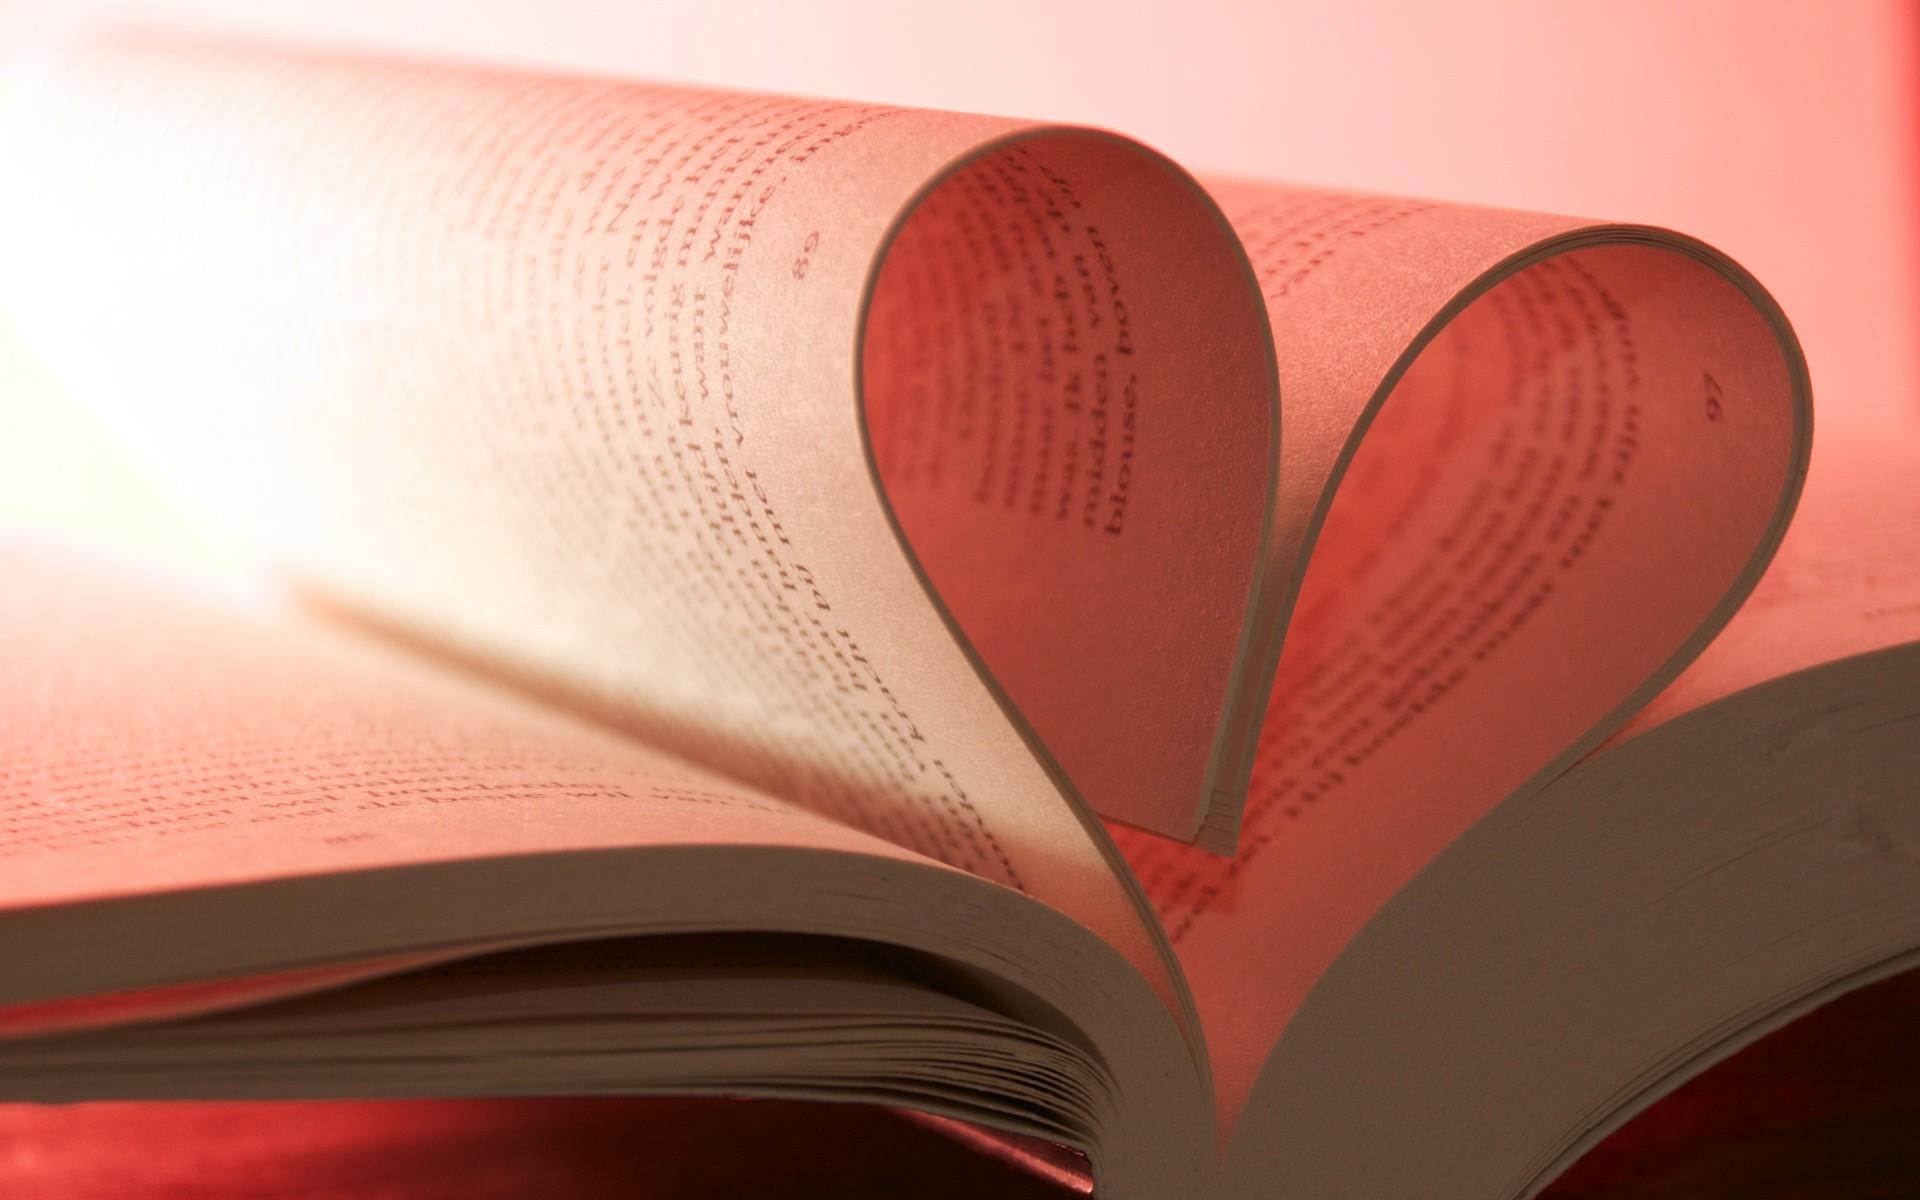 Открытки, картинки книги с надписями